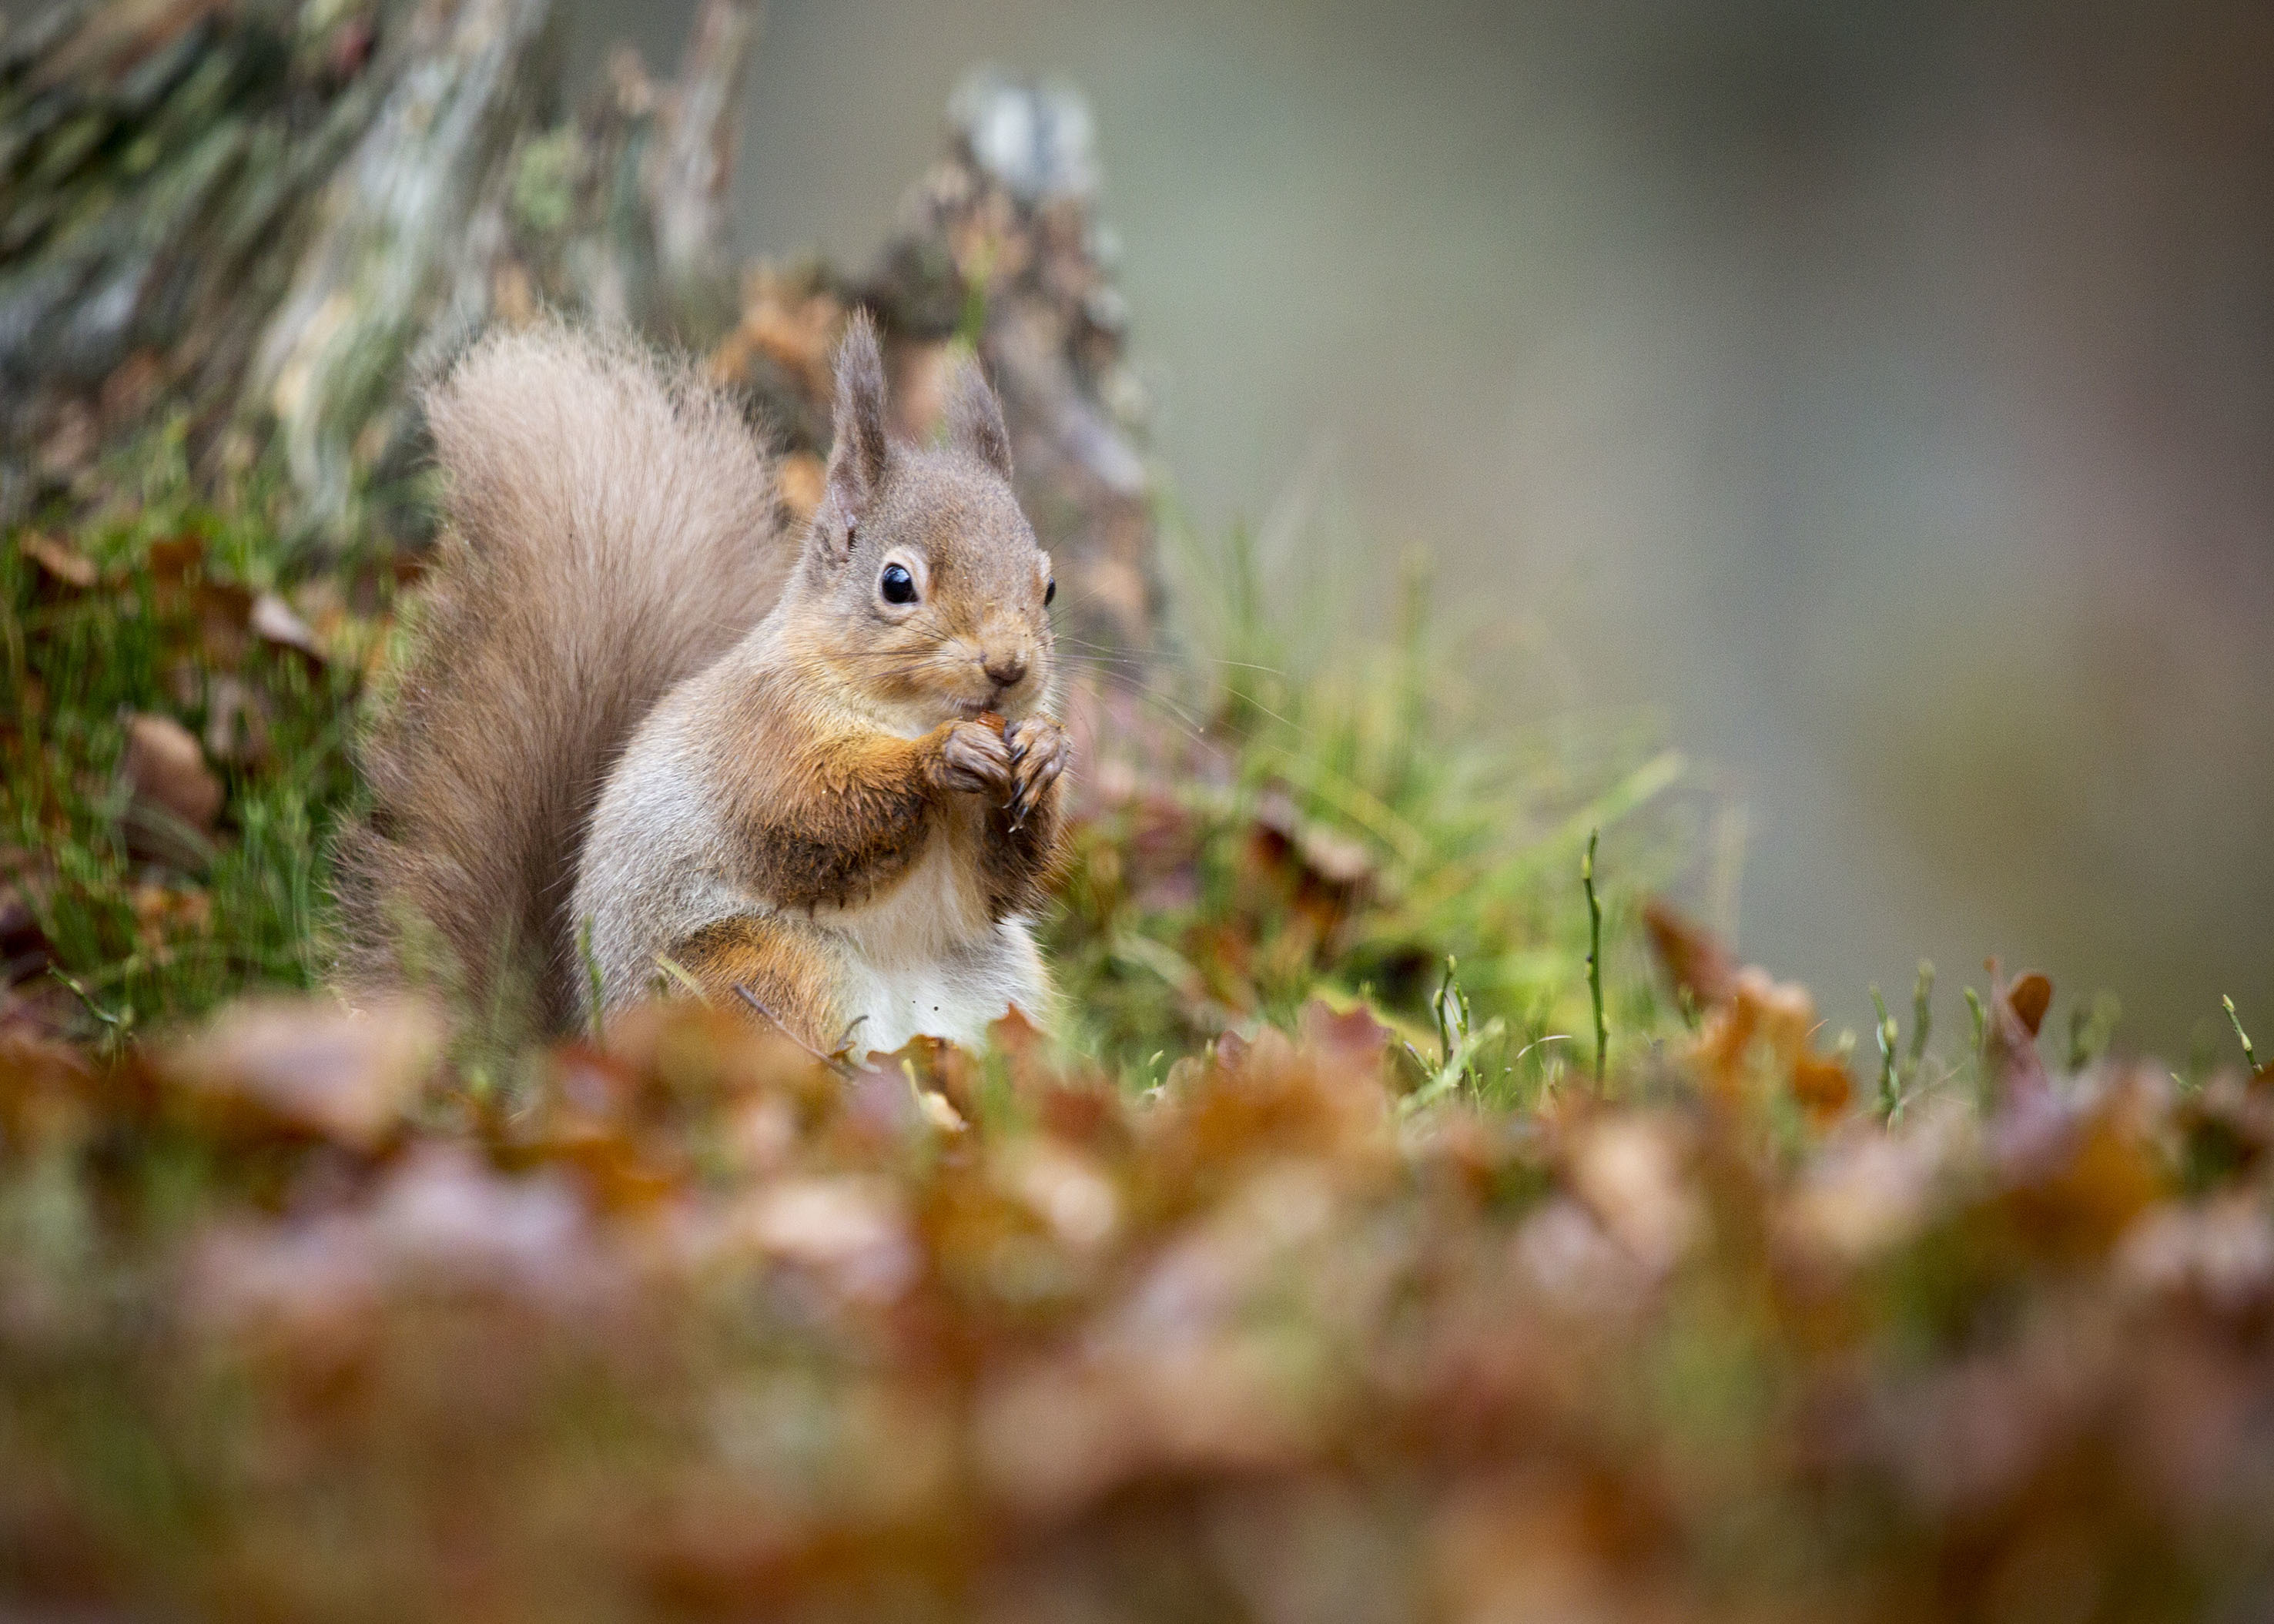 (Scottish Wildife Trust, Joanne Foo)